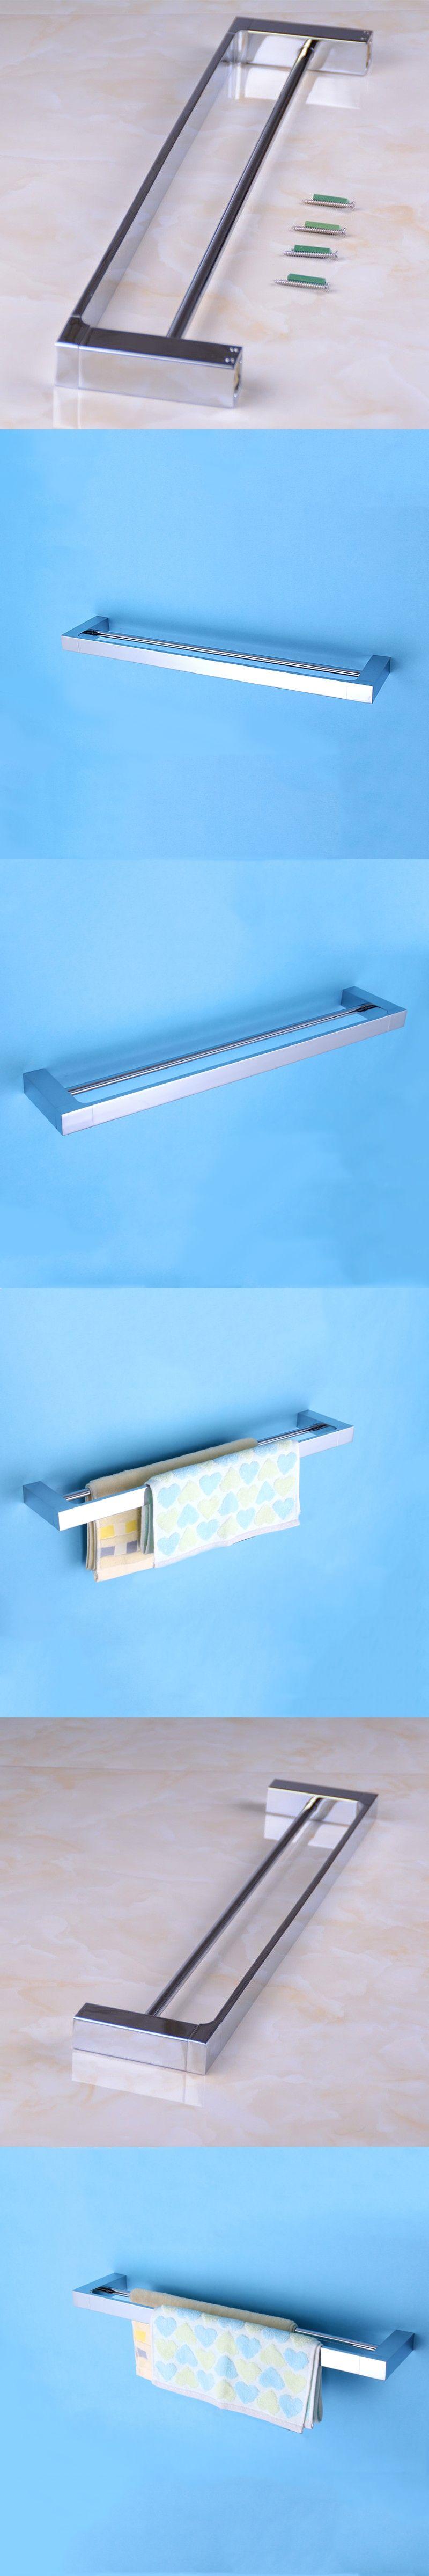 Nice Toilet Racks Sketch - Bathtub Design Ideas - klotsnet.com